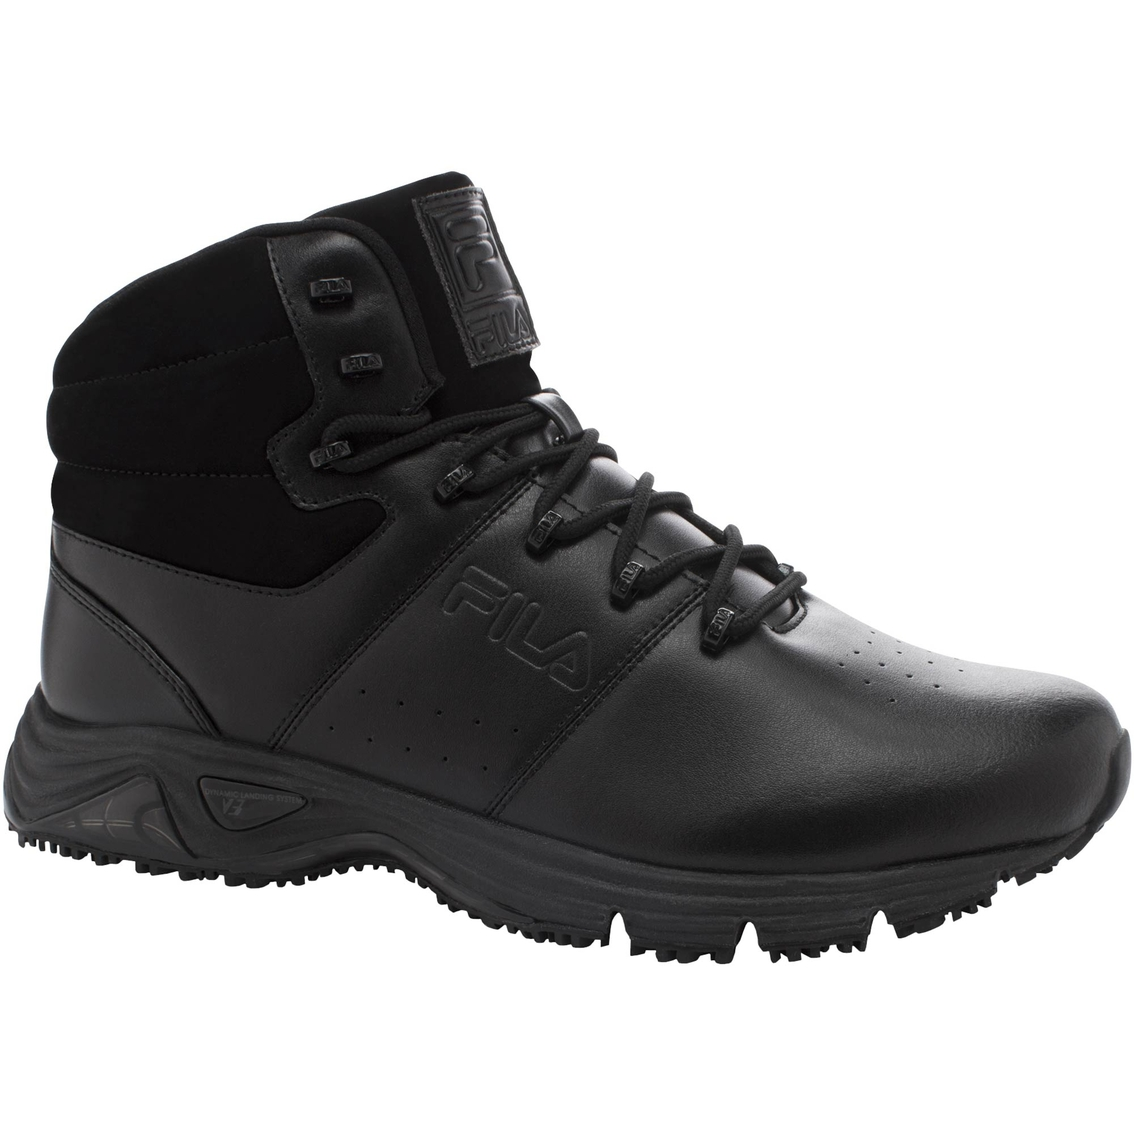 0ebe3a3c99 Fila Men's Memory Breach Slip Resistant Steel Toe Boots | Work ...